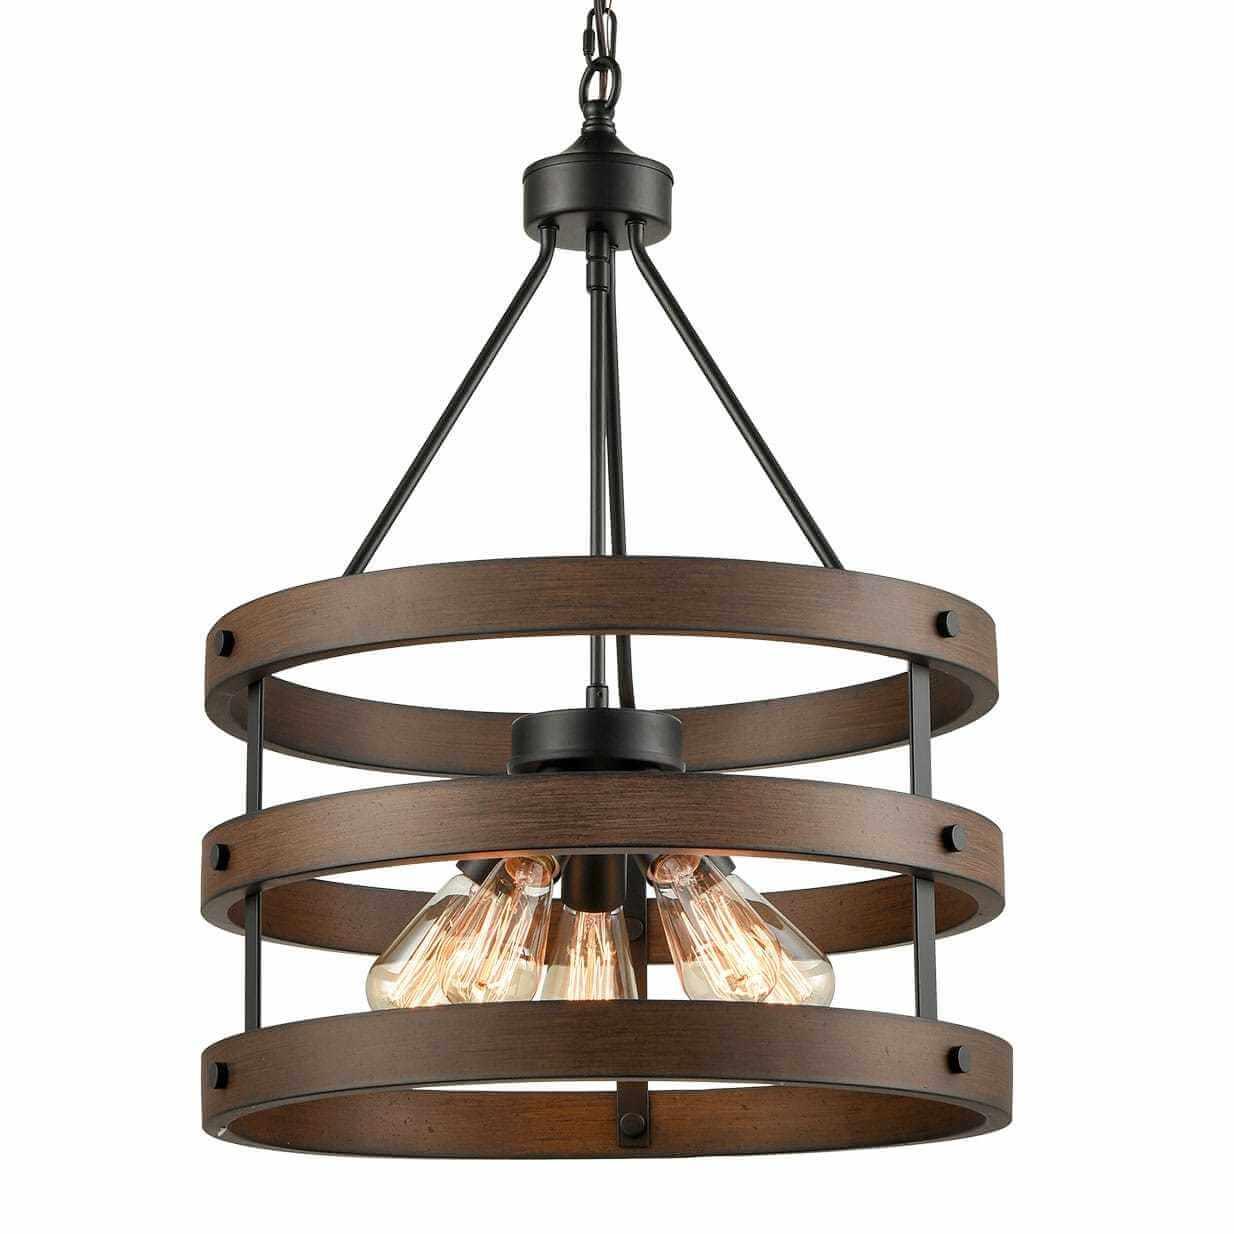 Rustic Wood Accent Circular Drum Chandeliers Vintage Large Pendant Light